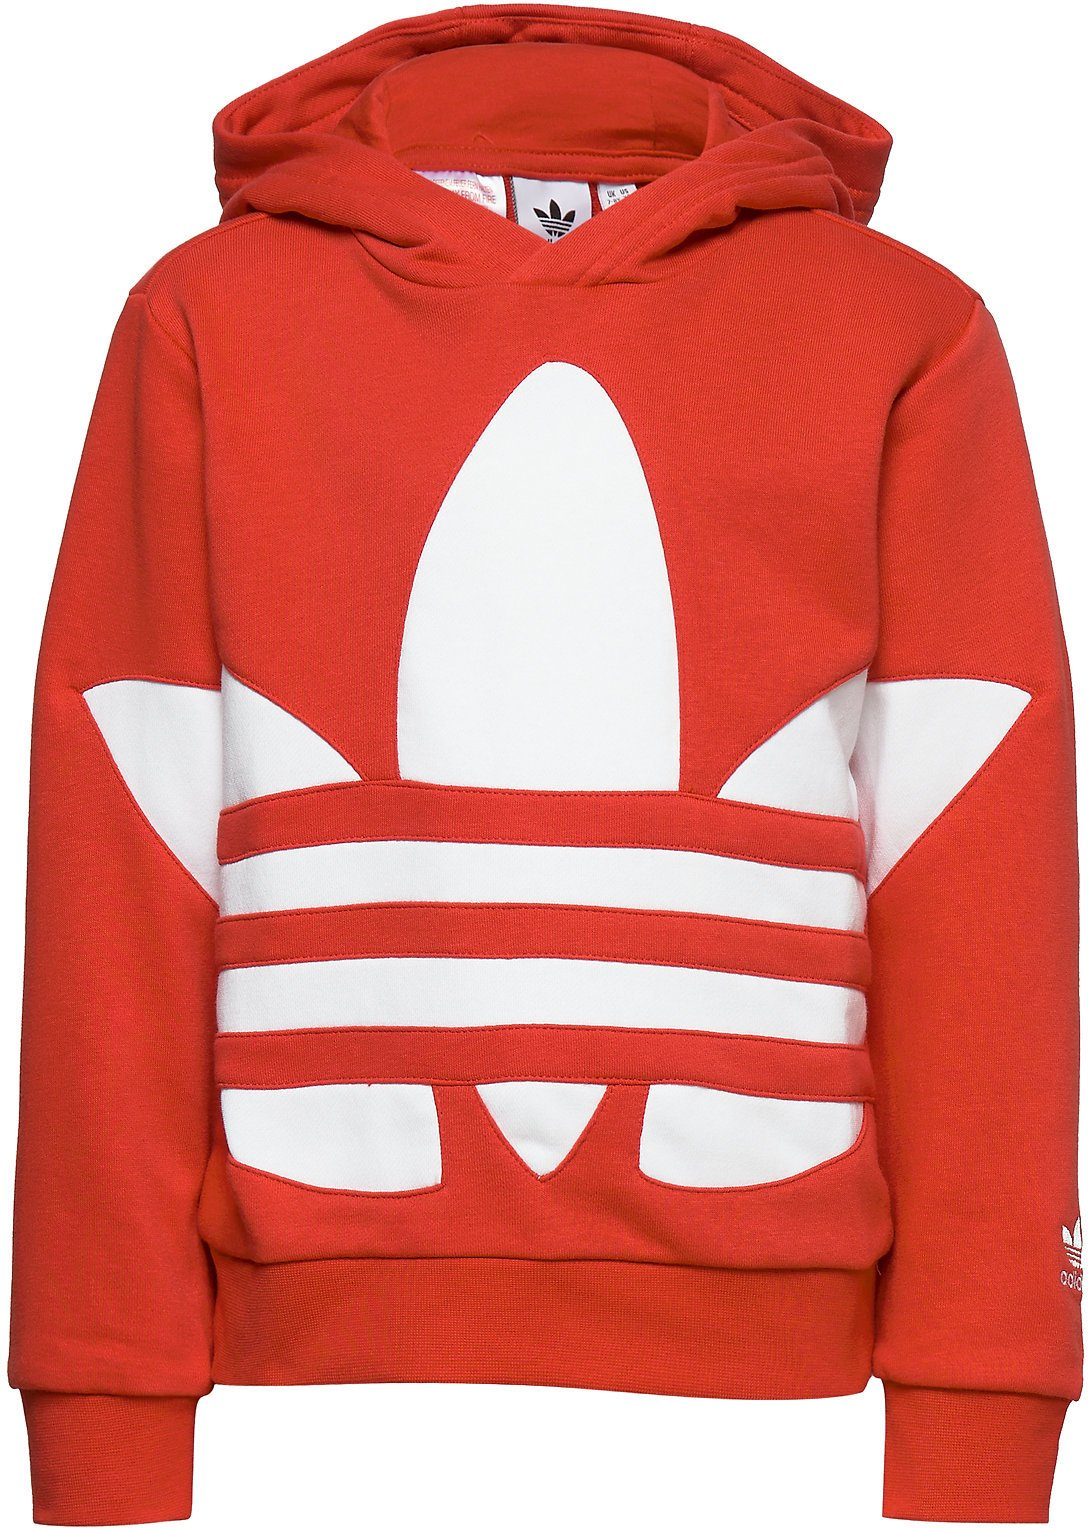 Adidas Originals Big Trefoil Hoodie